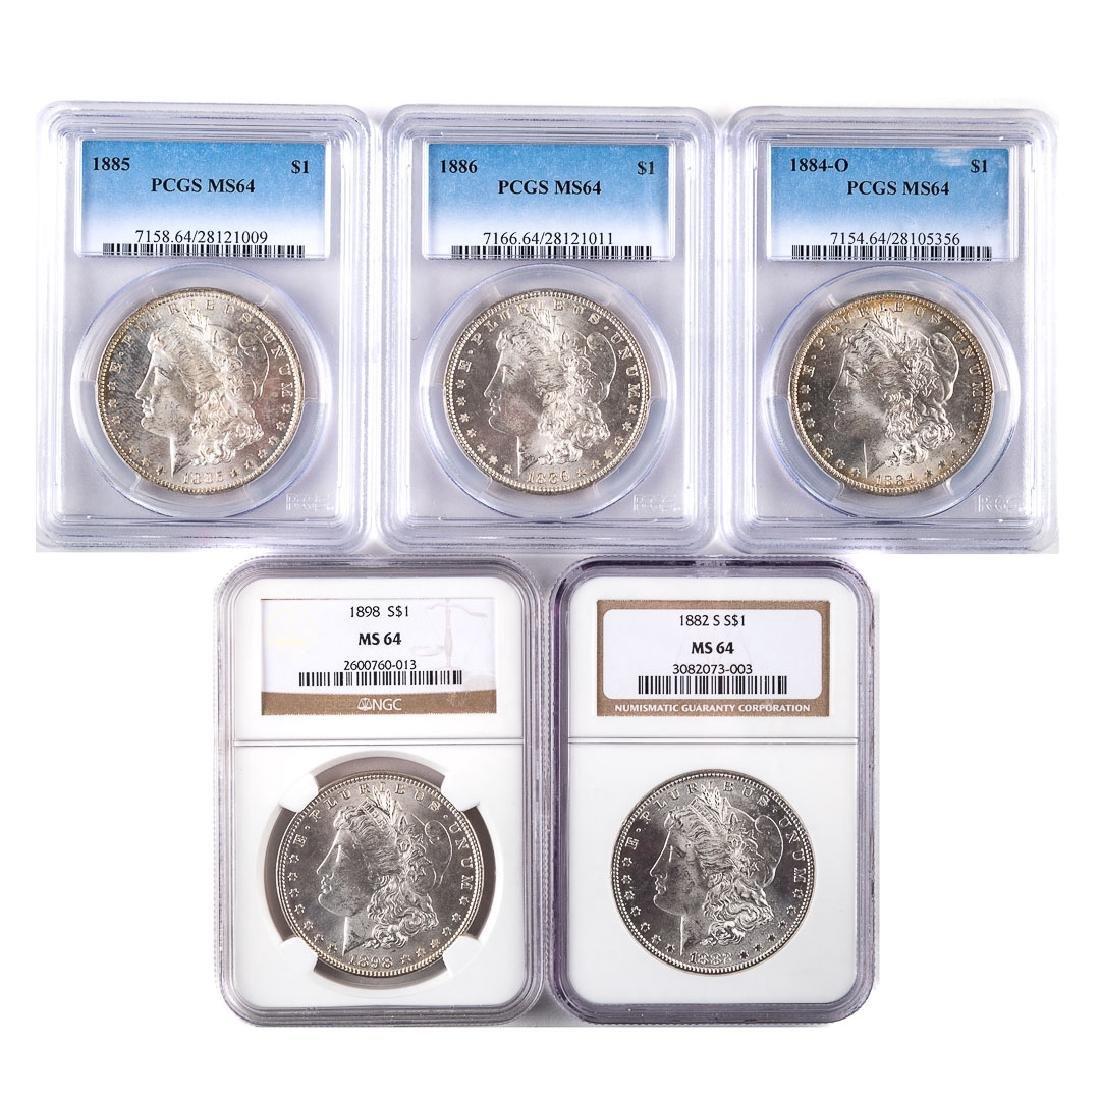 [US] 5 Mint State-64 Certified Morgan Dollars